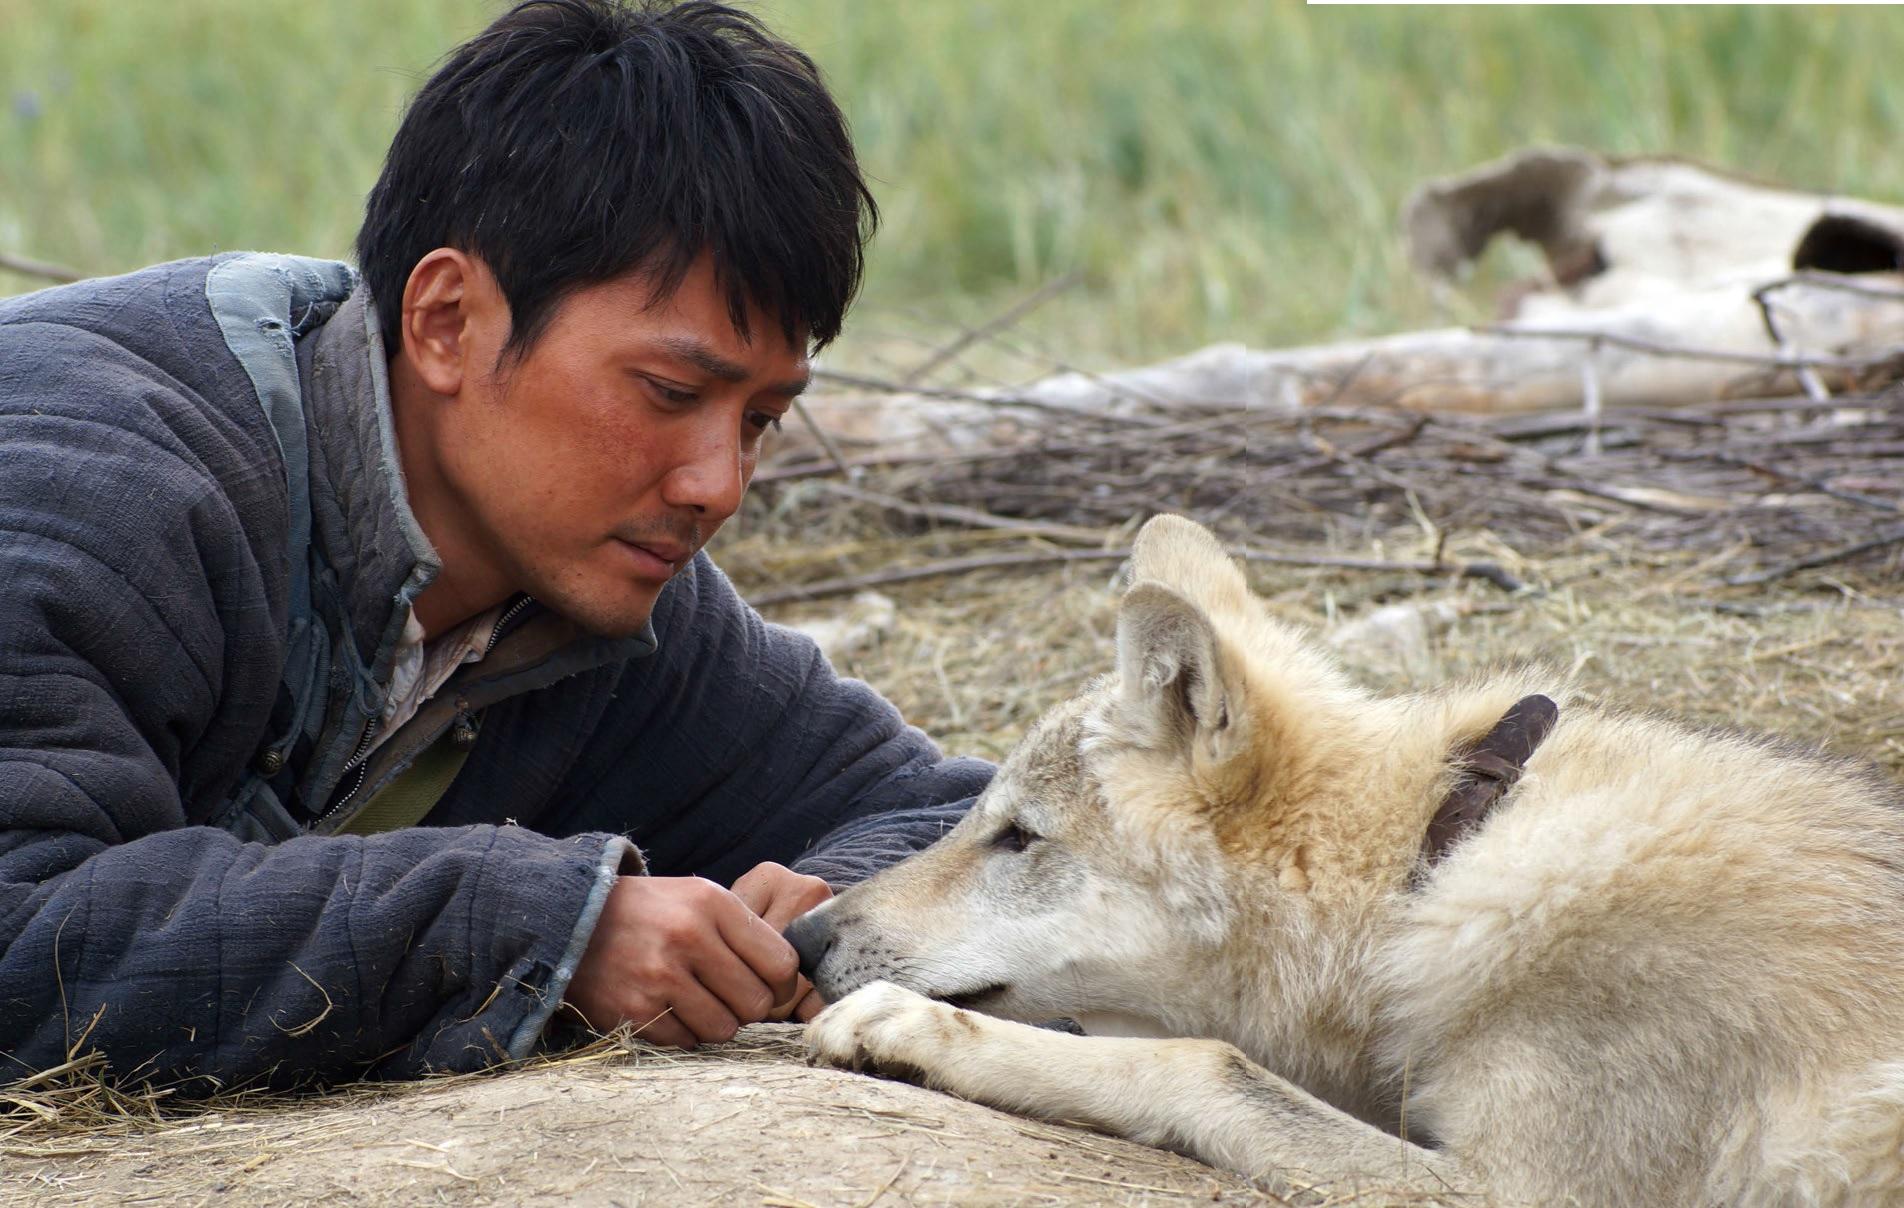 lupi nel mondo